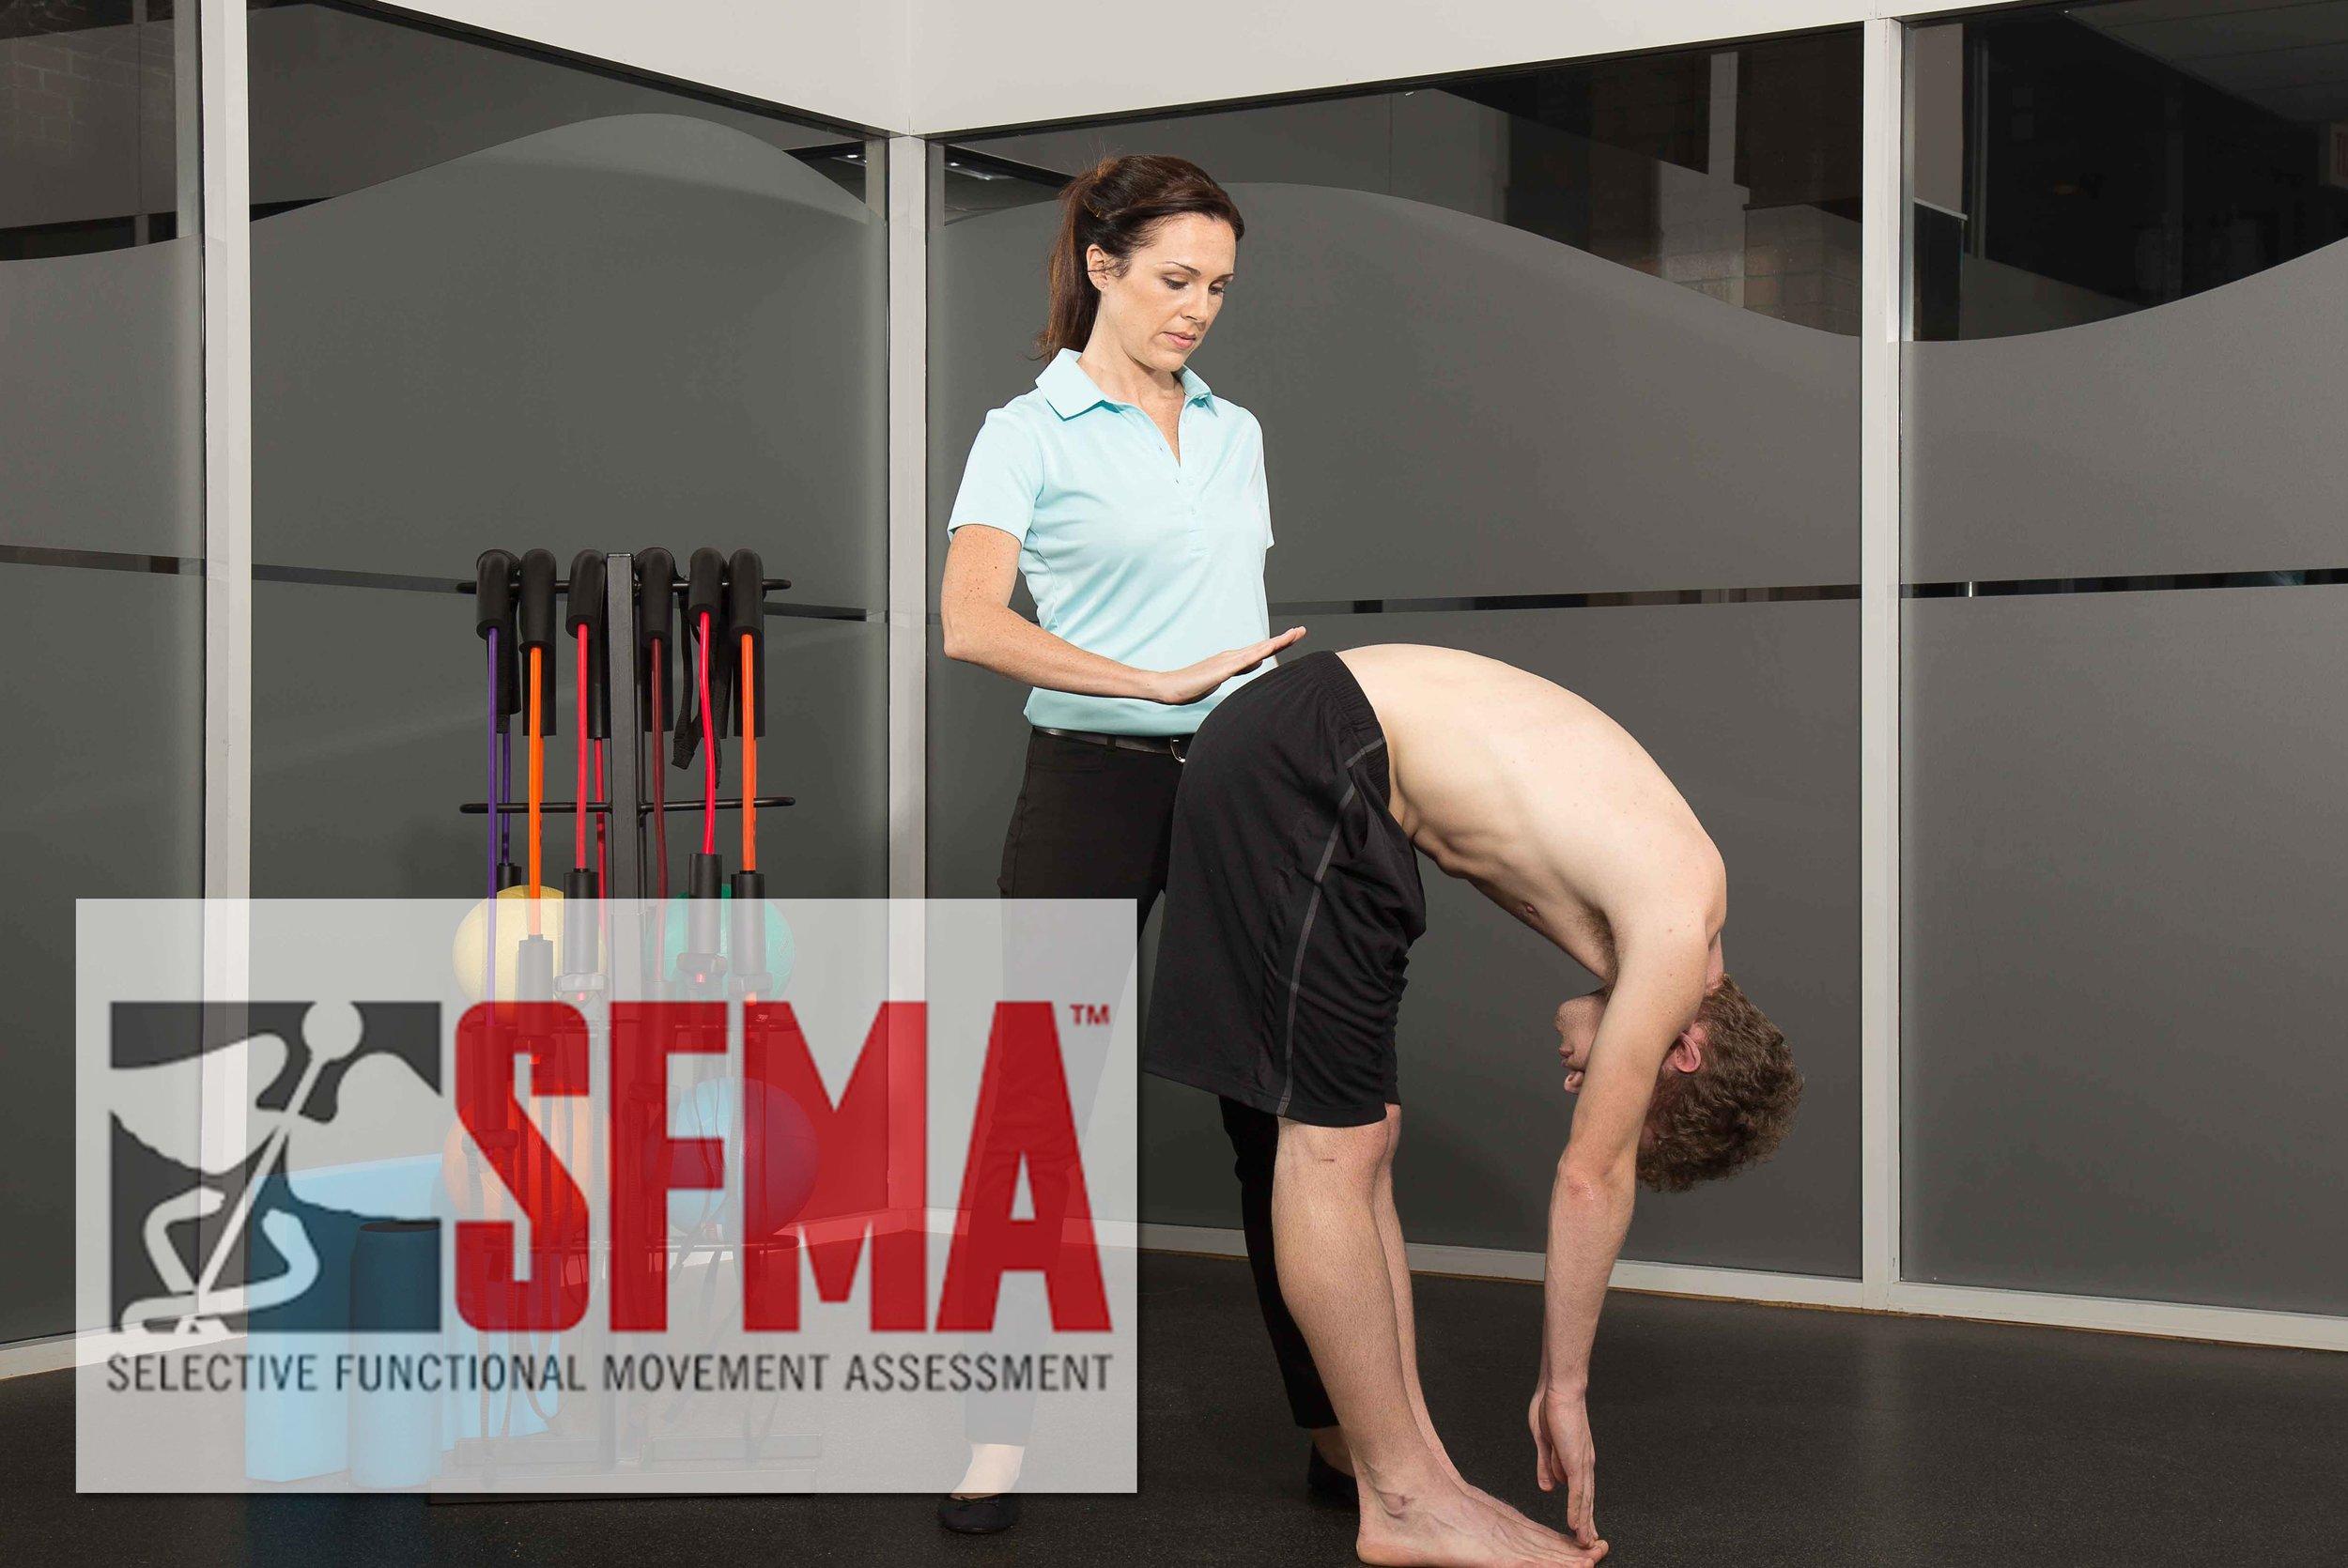 sfma logo pic.jpg